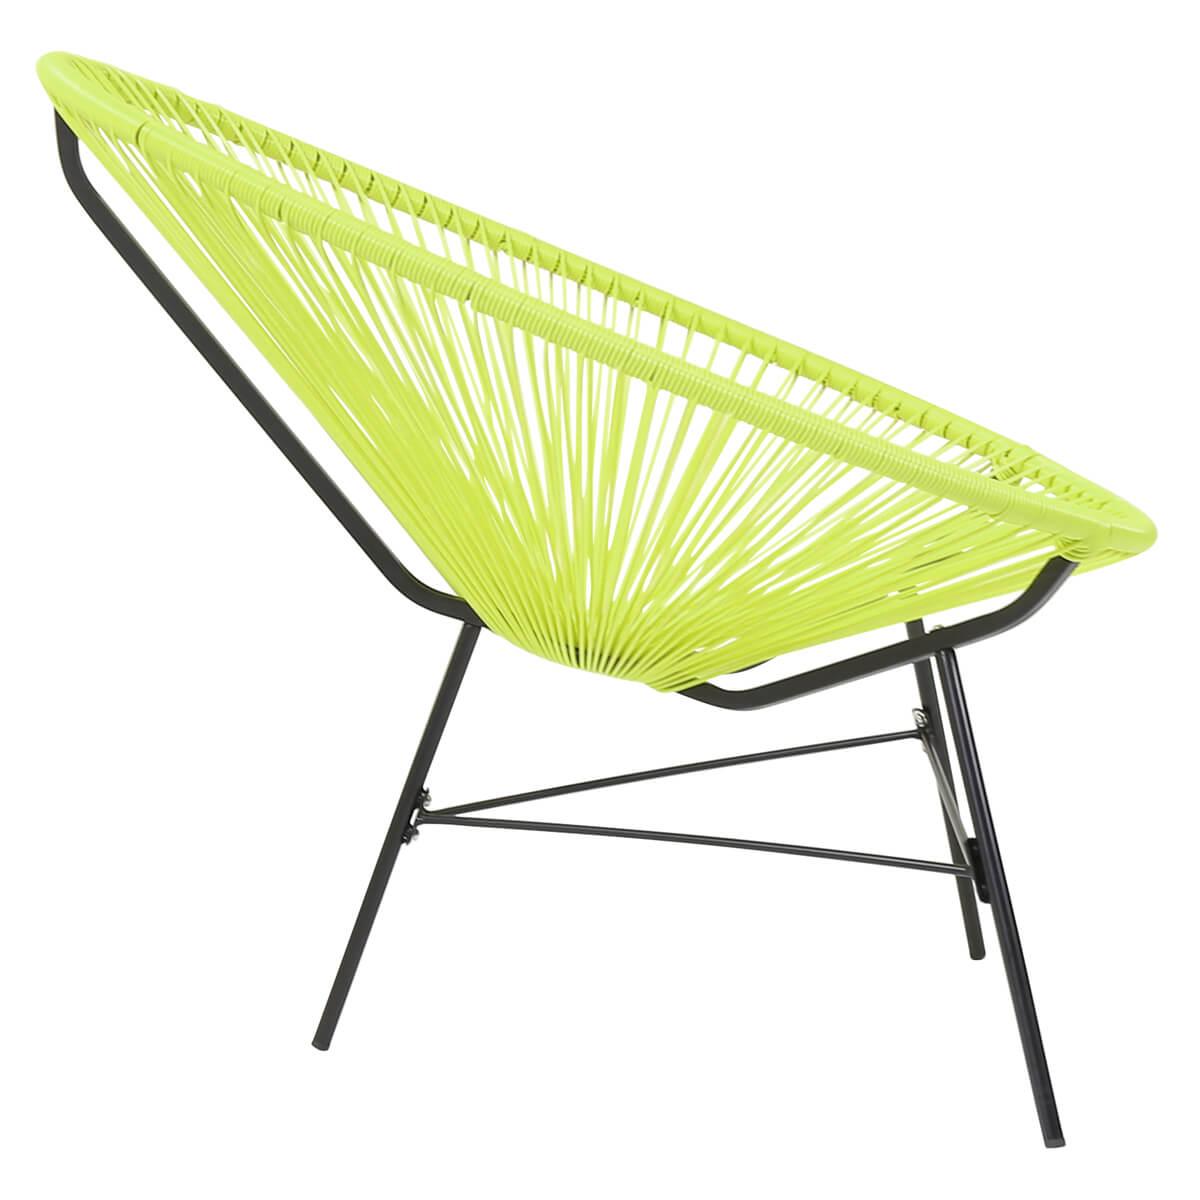 Charles Bentley Garden Furniture Retro Lounge Single Chairs 12 ...